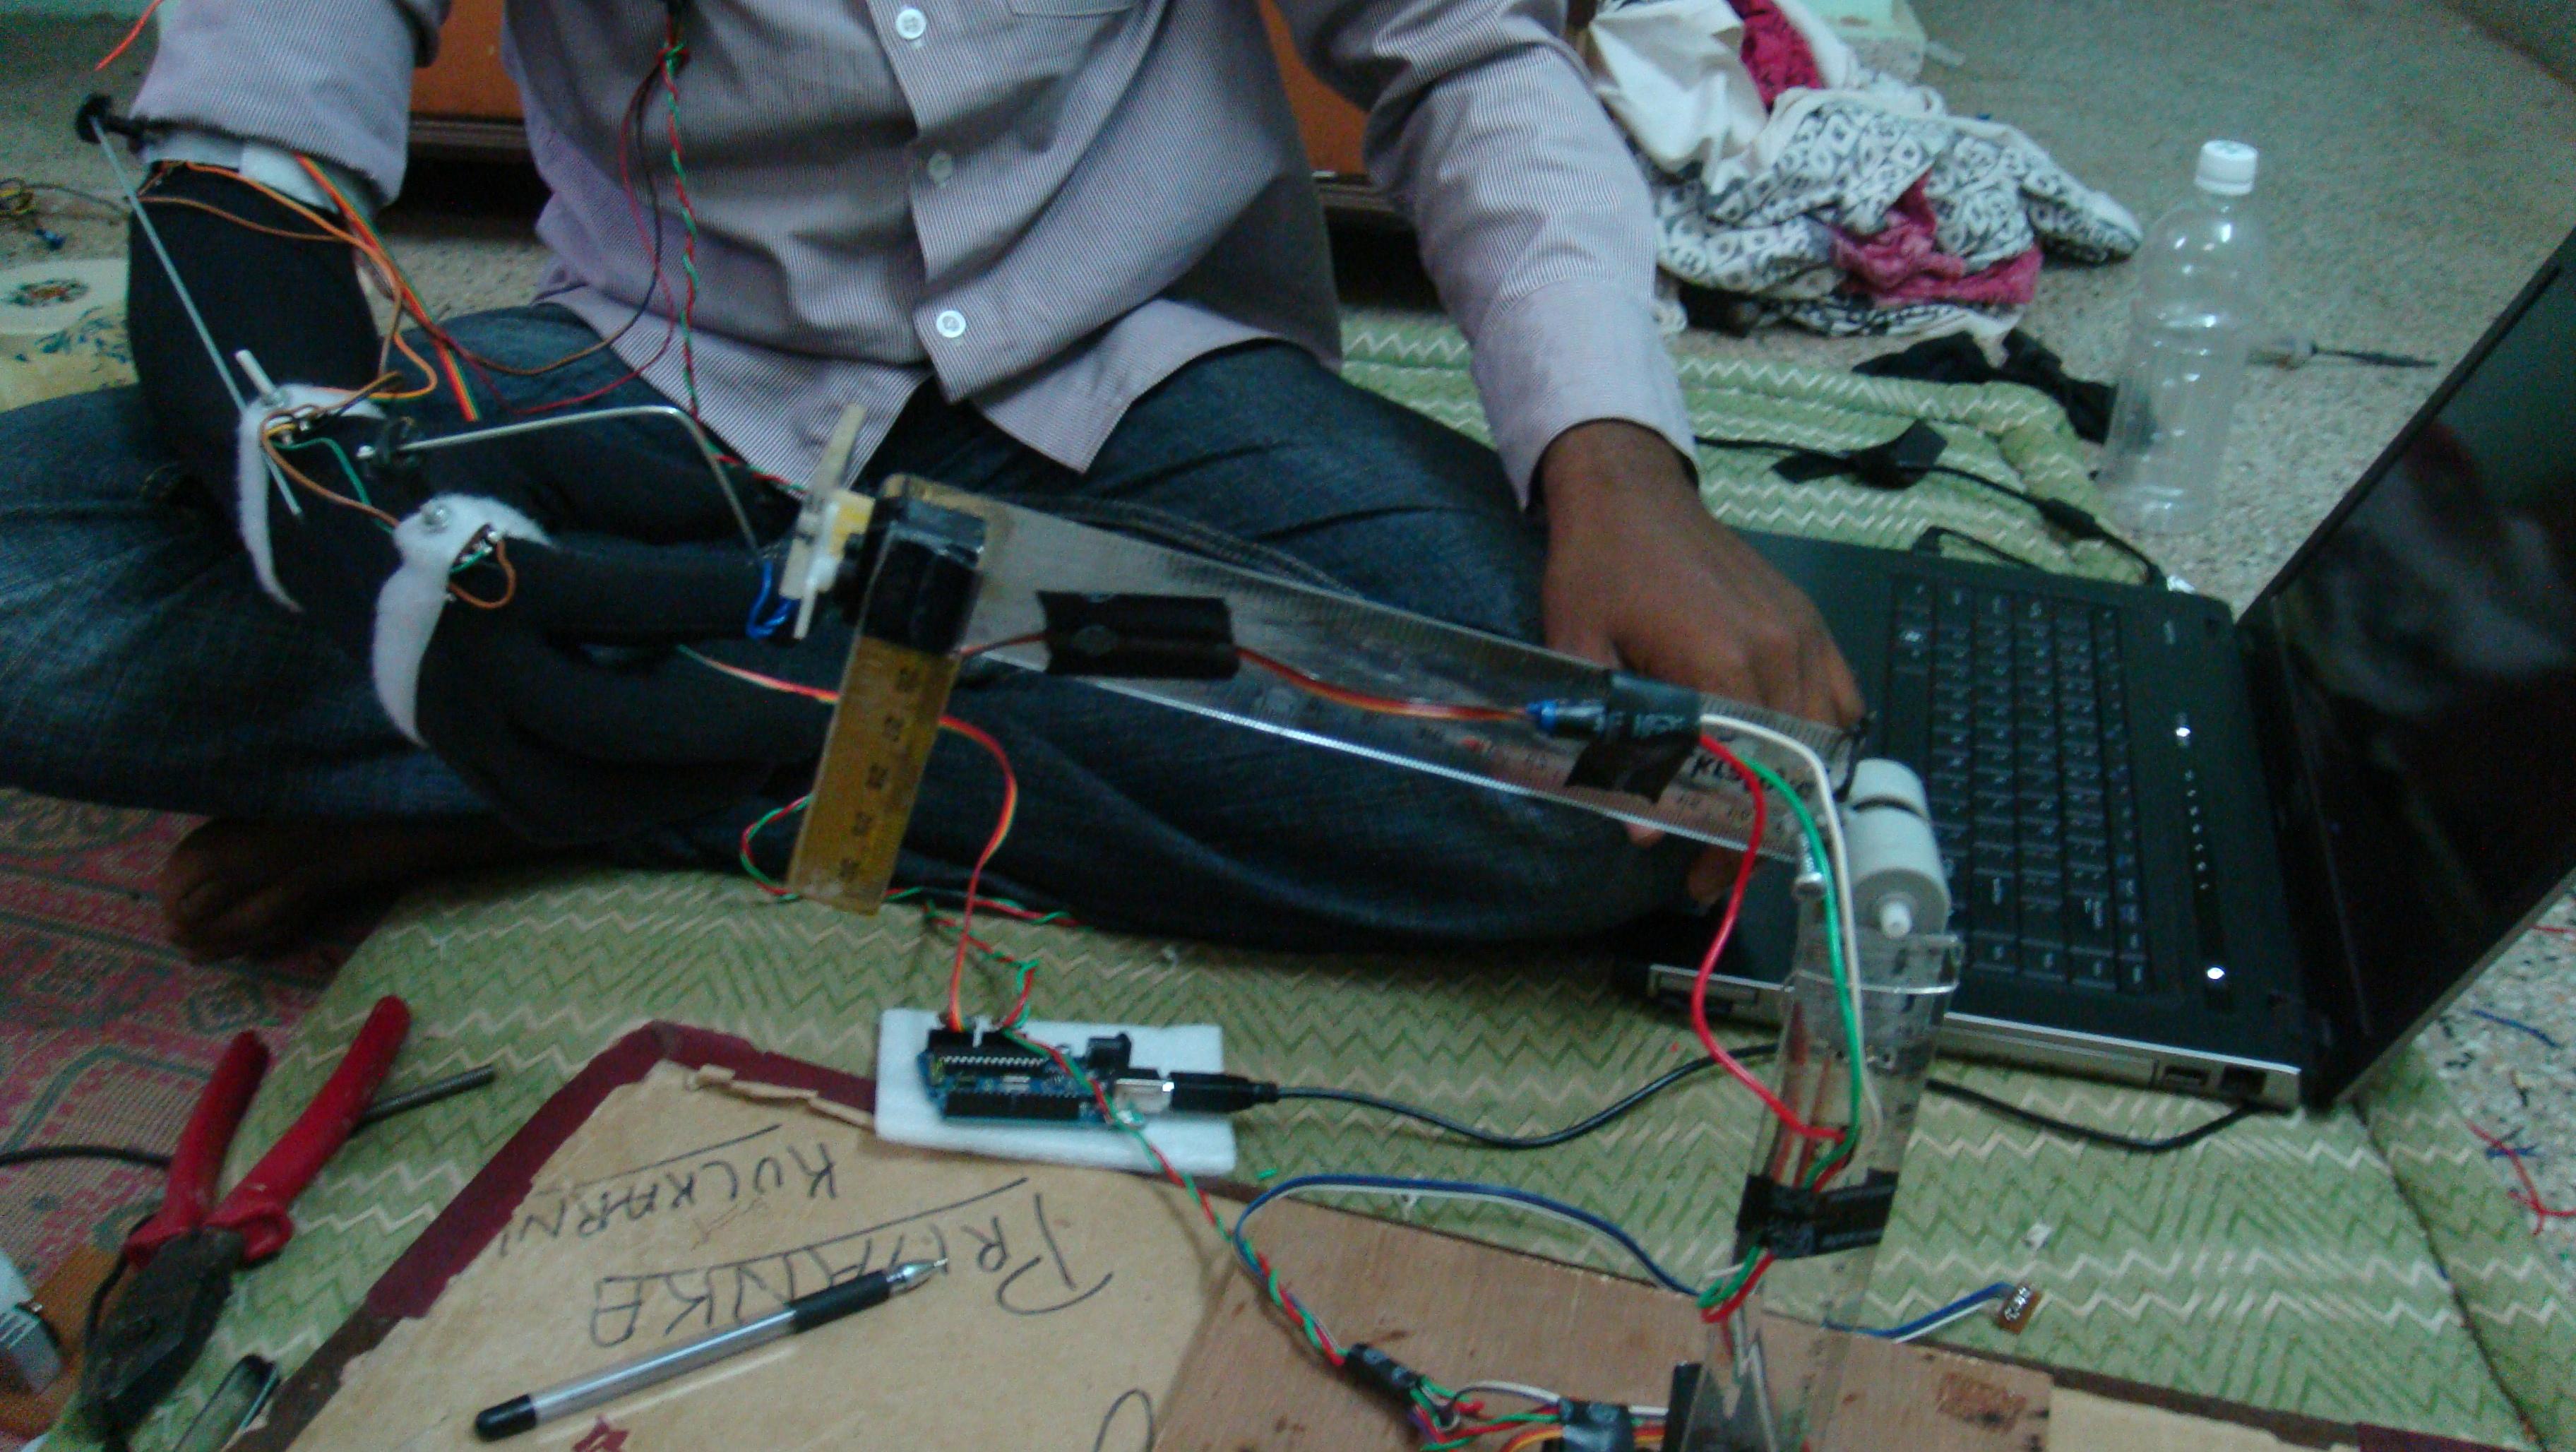 Interactive robotic hand using arduino...